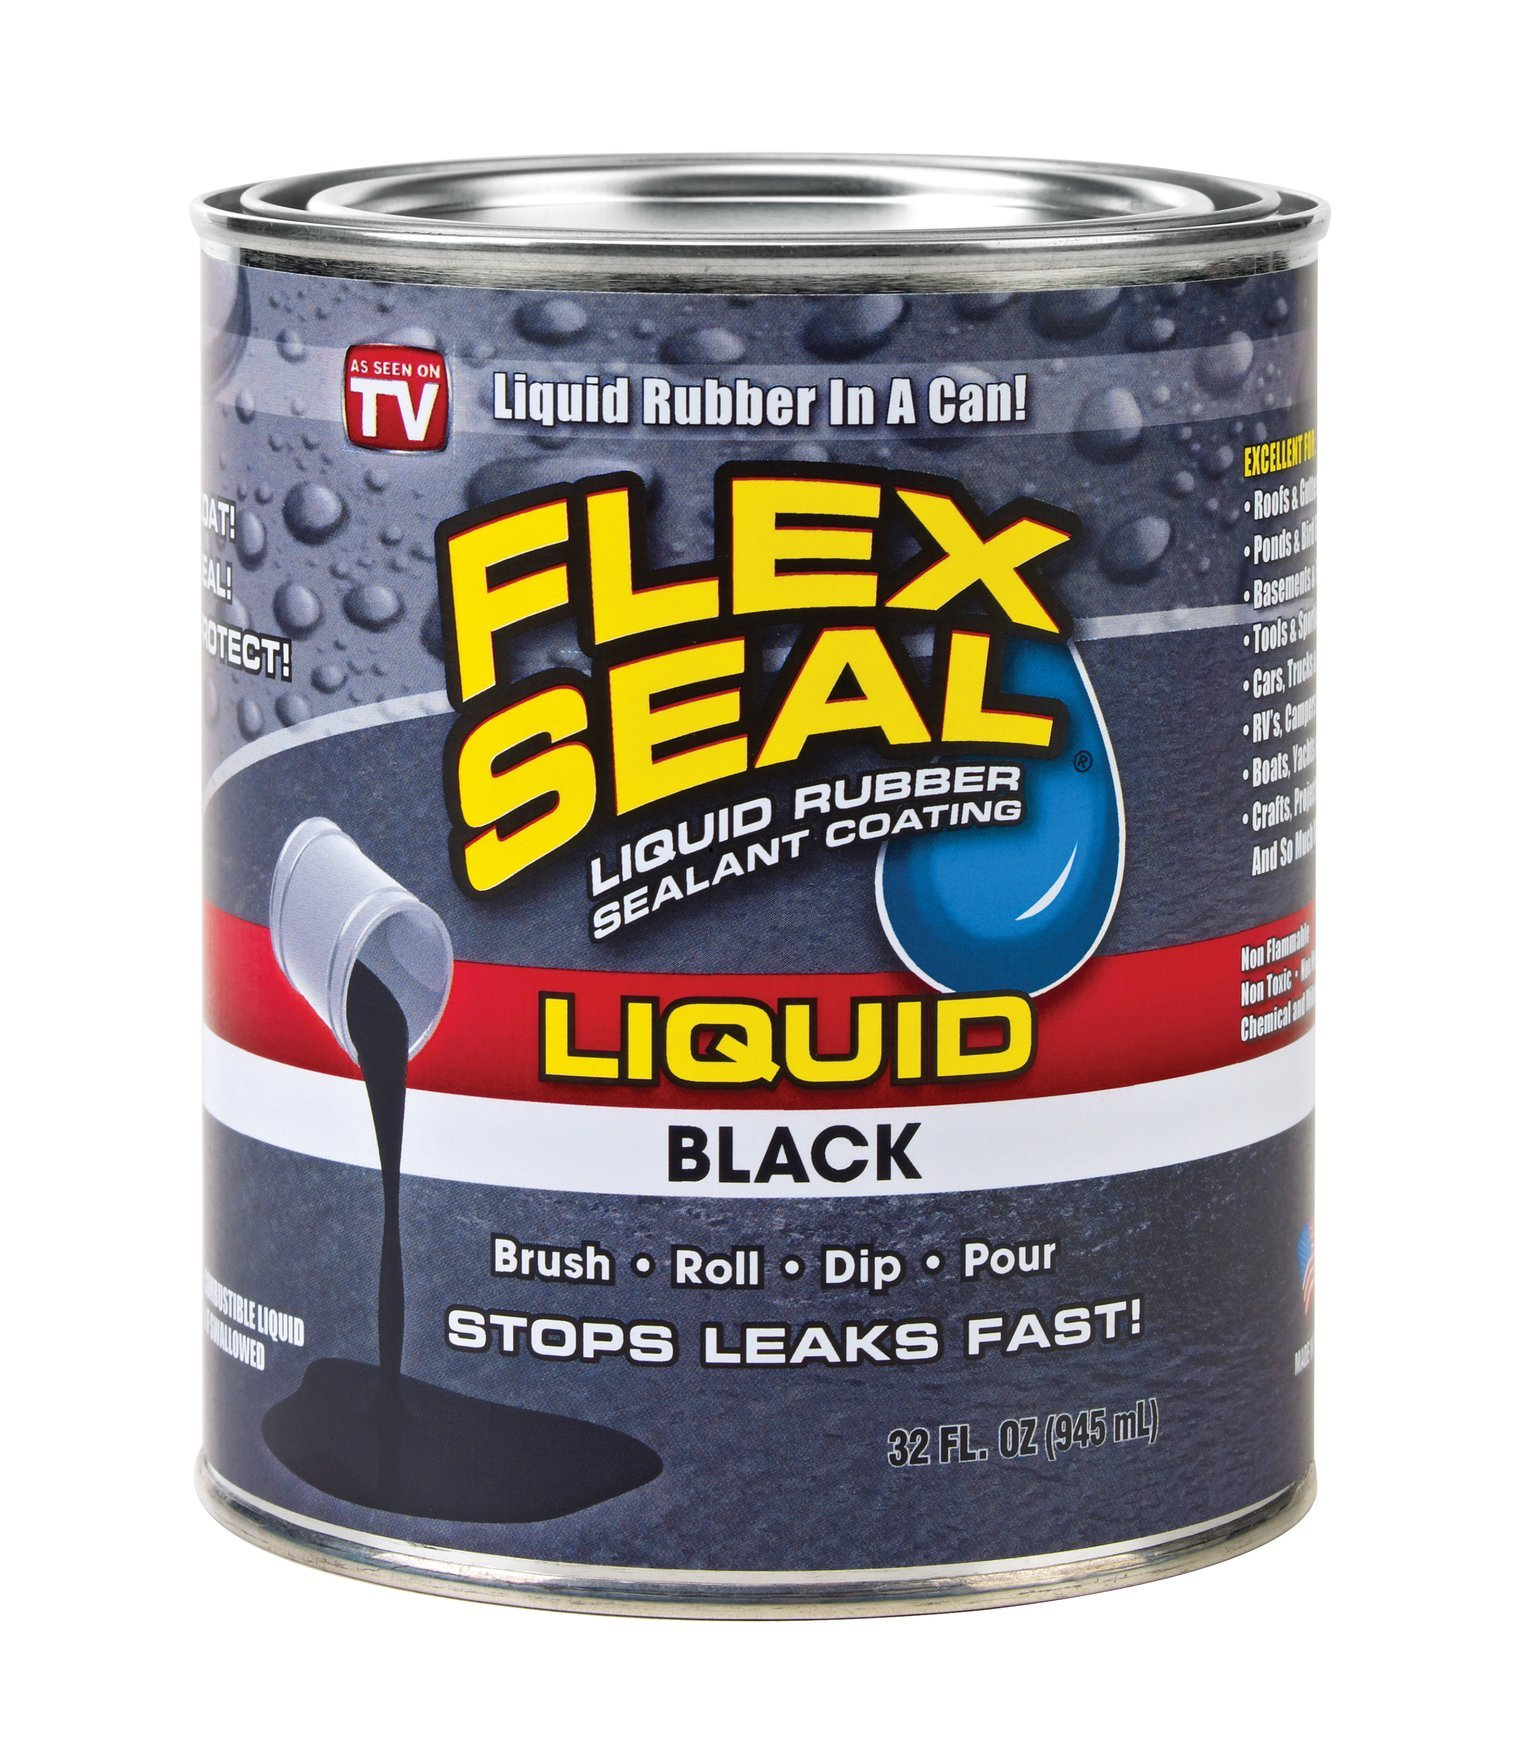 Flex Seal Liquid Rubber in a Can, 32-oz, Black by Flex Seal Liquid (Image #1)